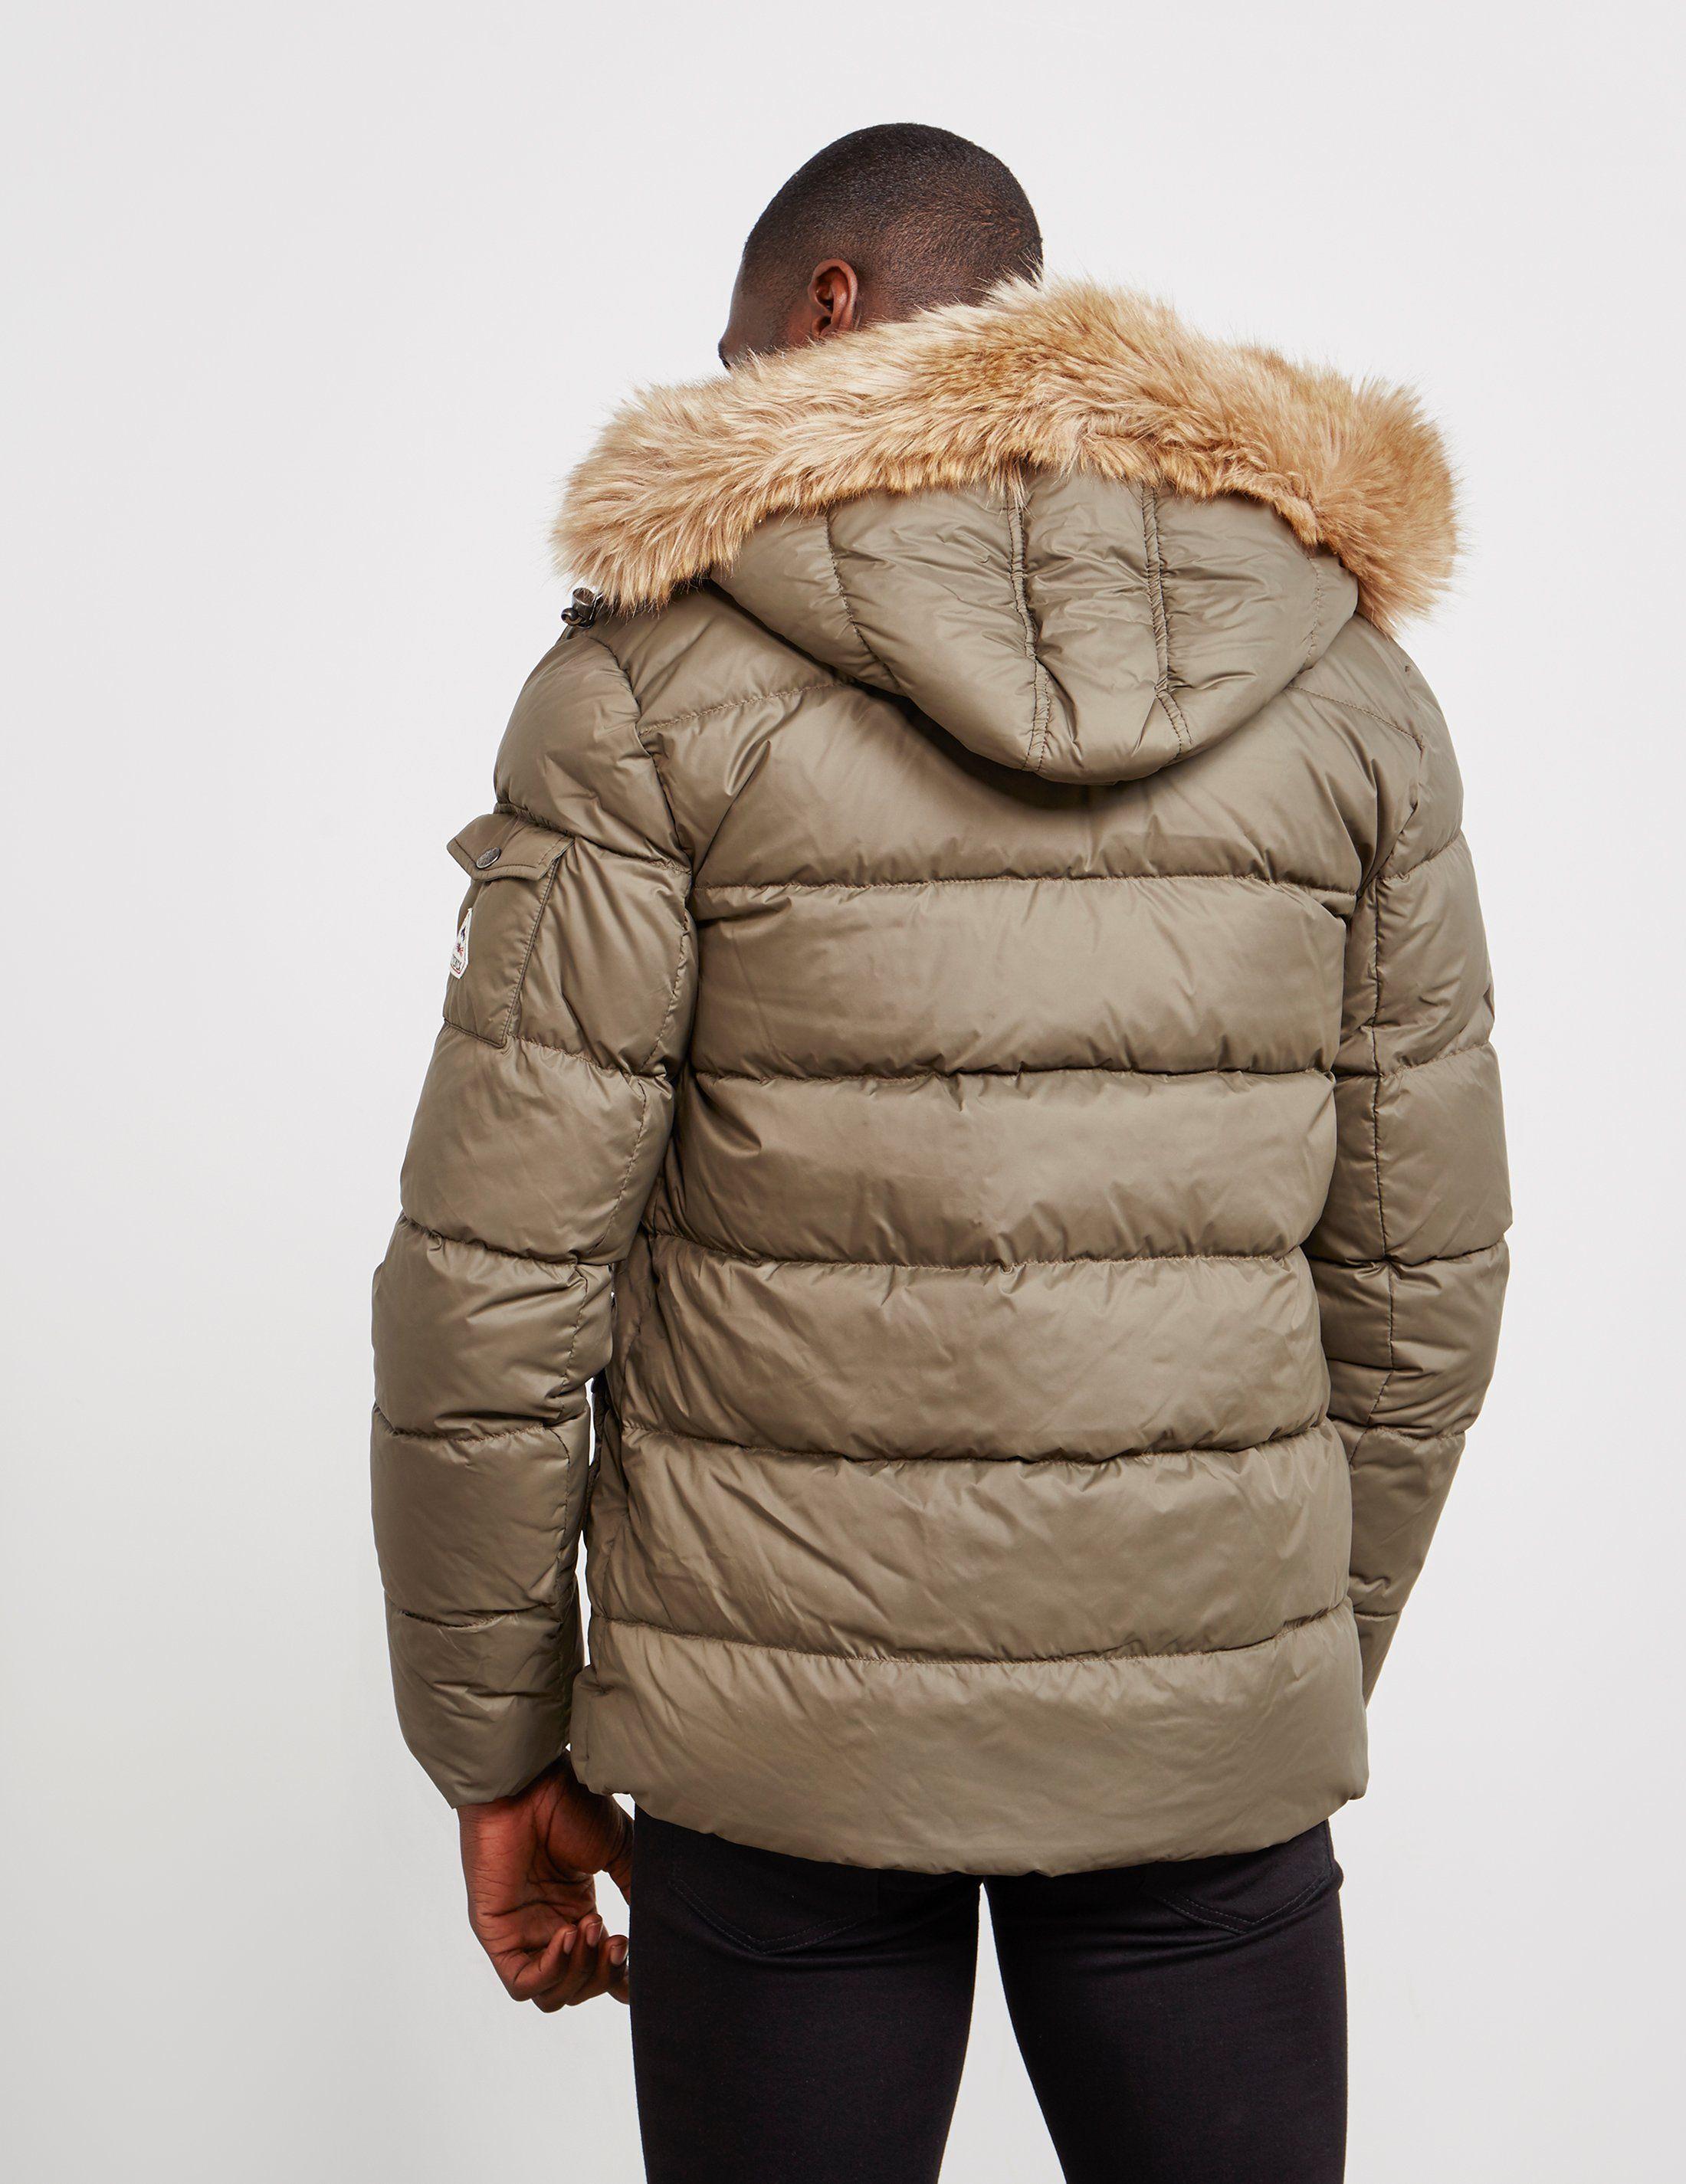 Pyrenex Authentic Jacket - Online Exclusive